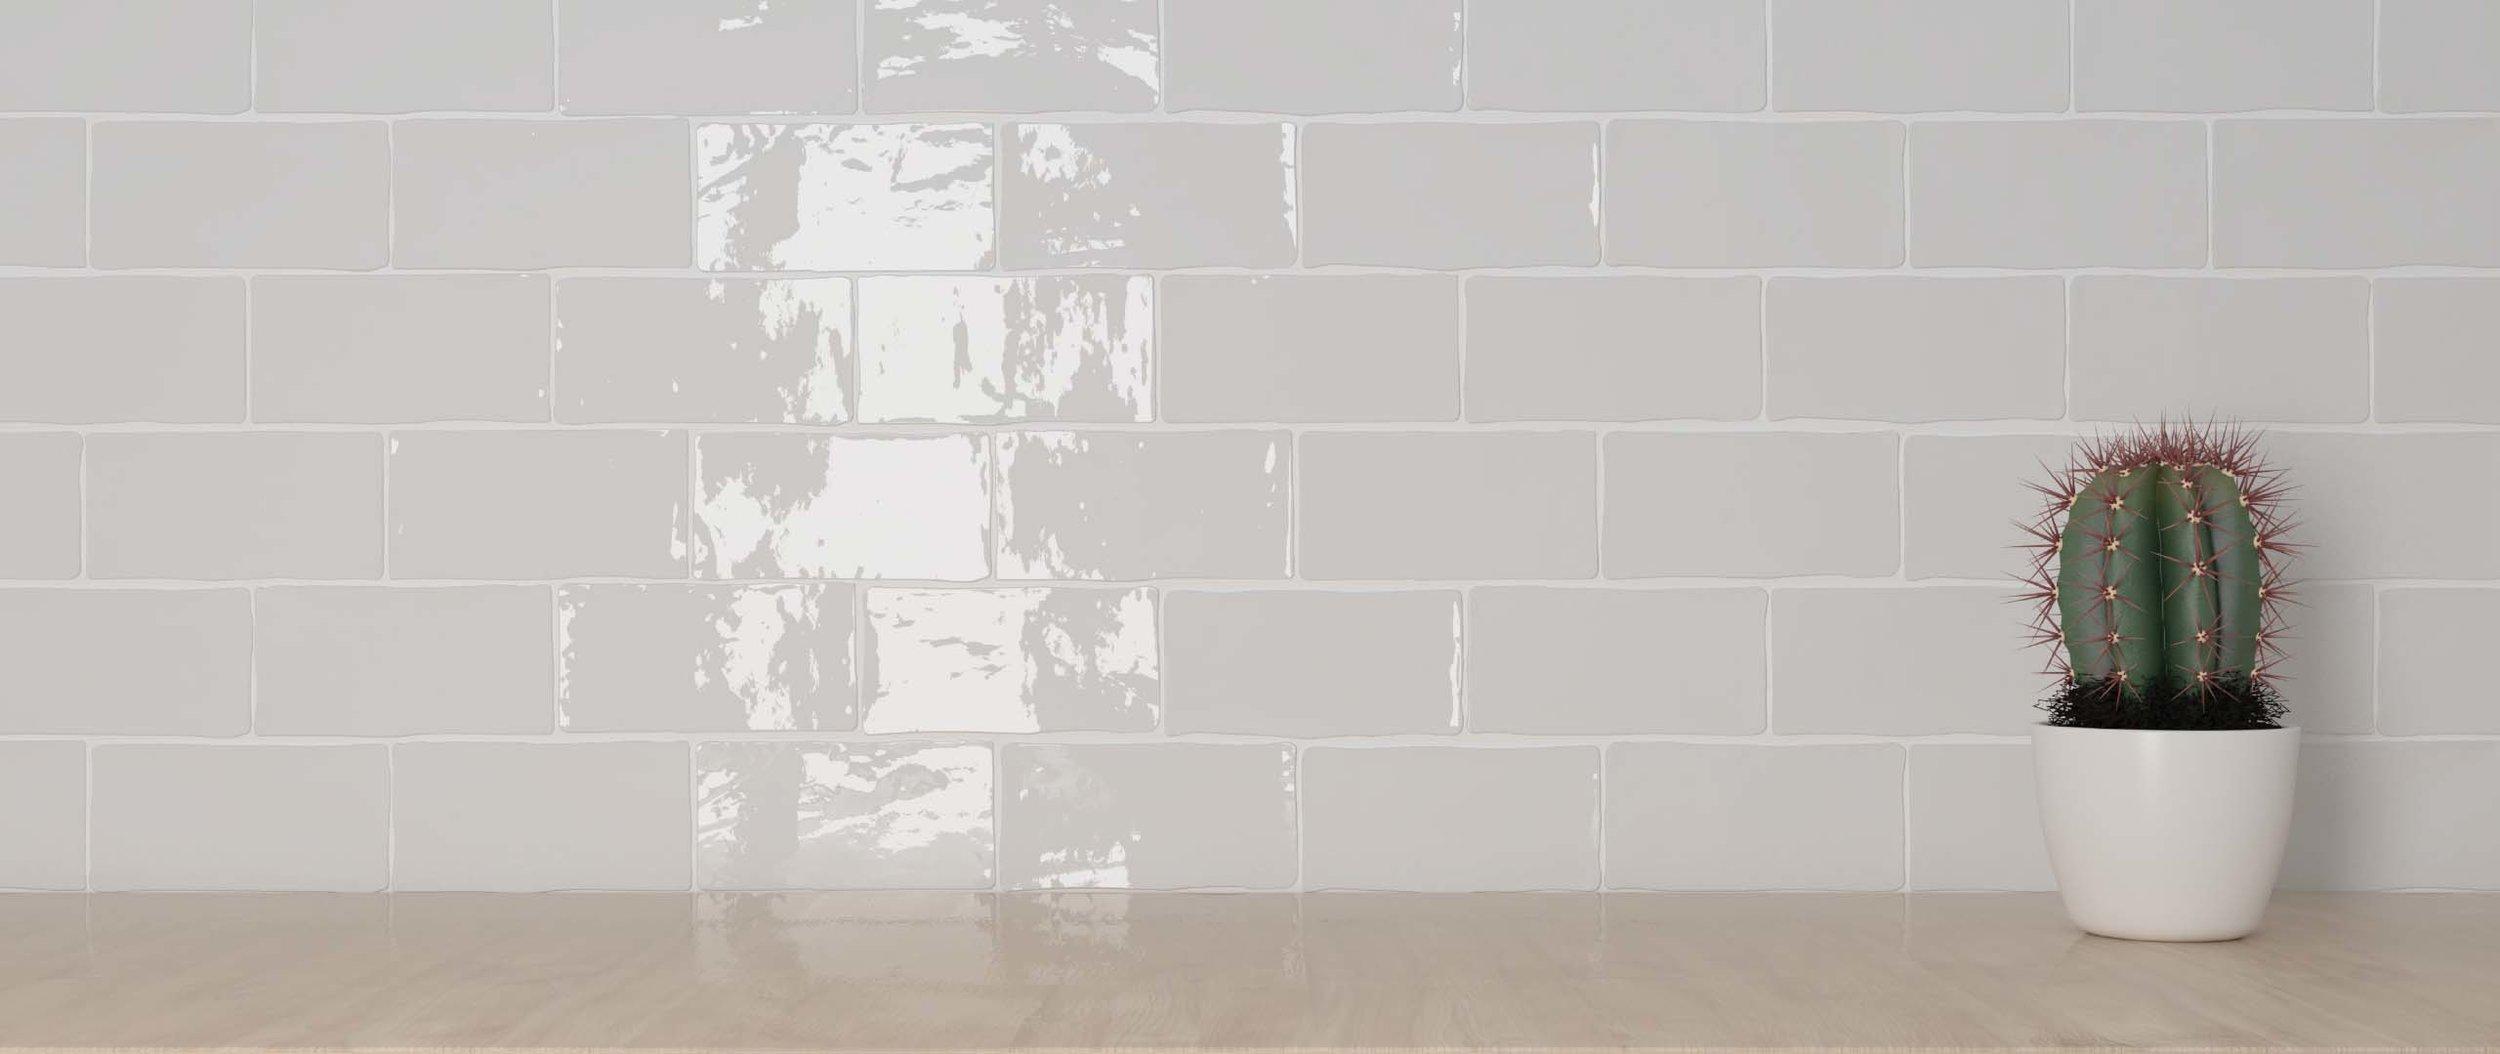 3x6gallery02.jpg